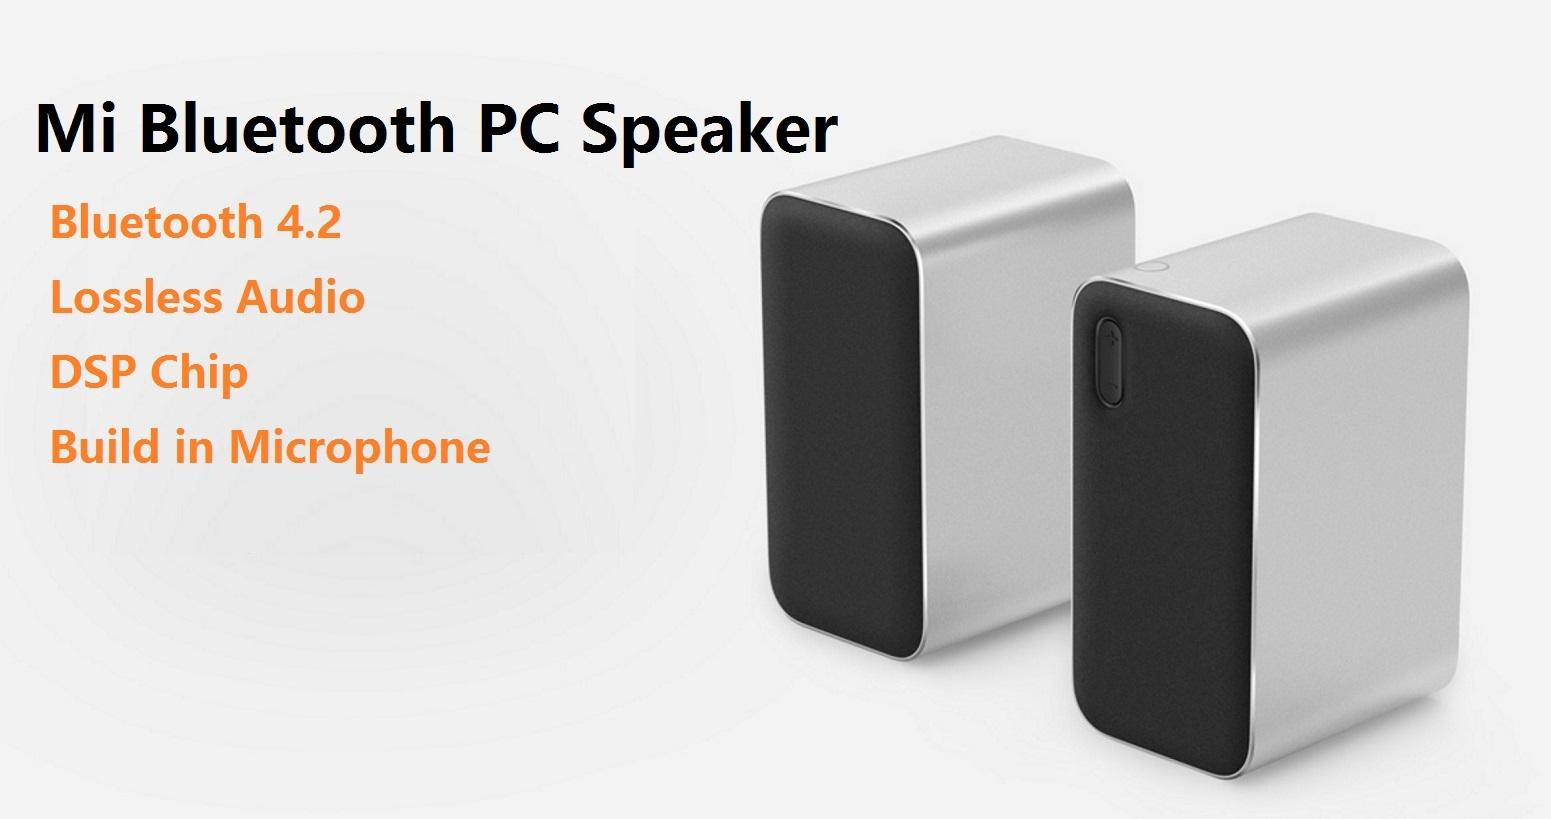 Mi Bluetooth PC Speaker